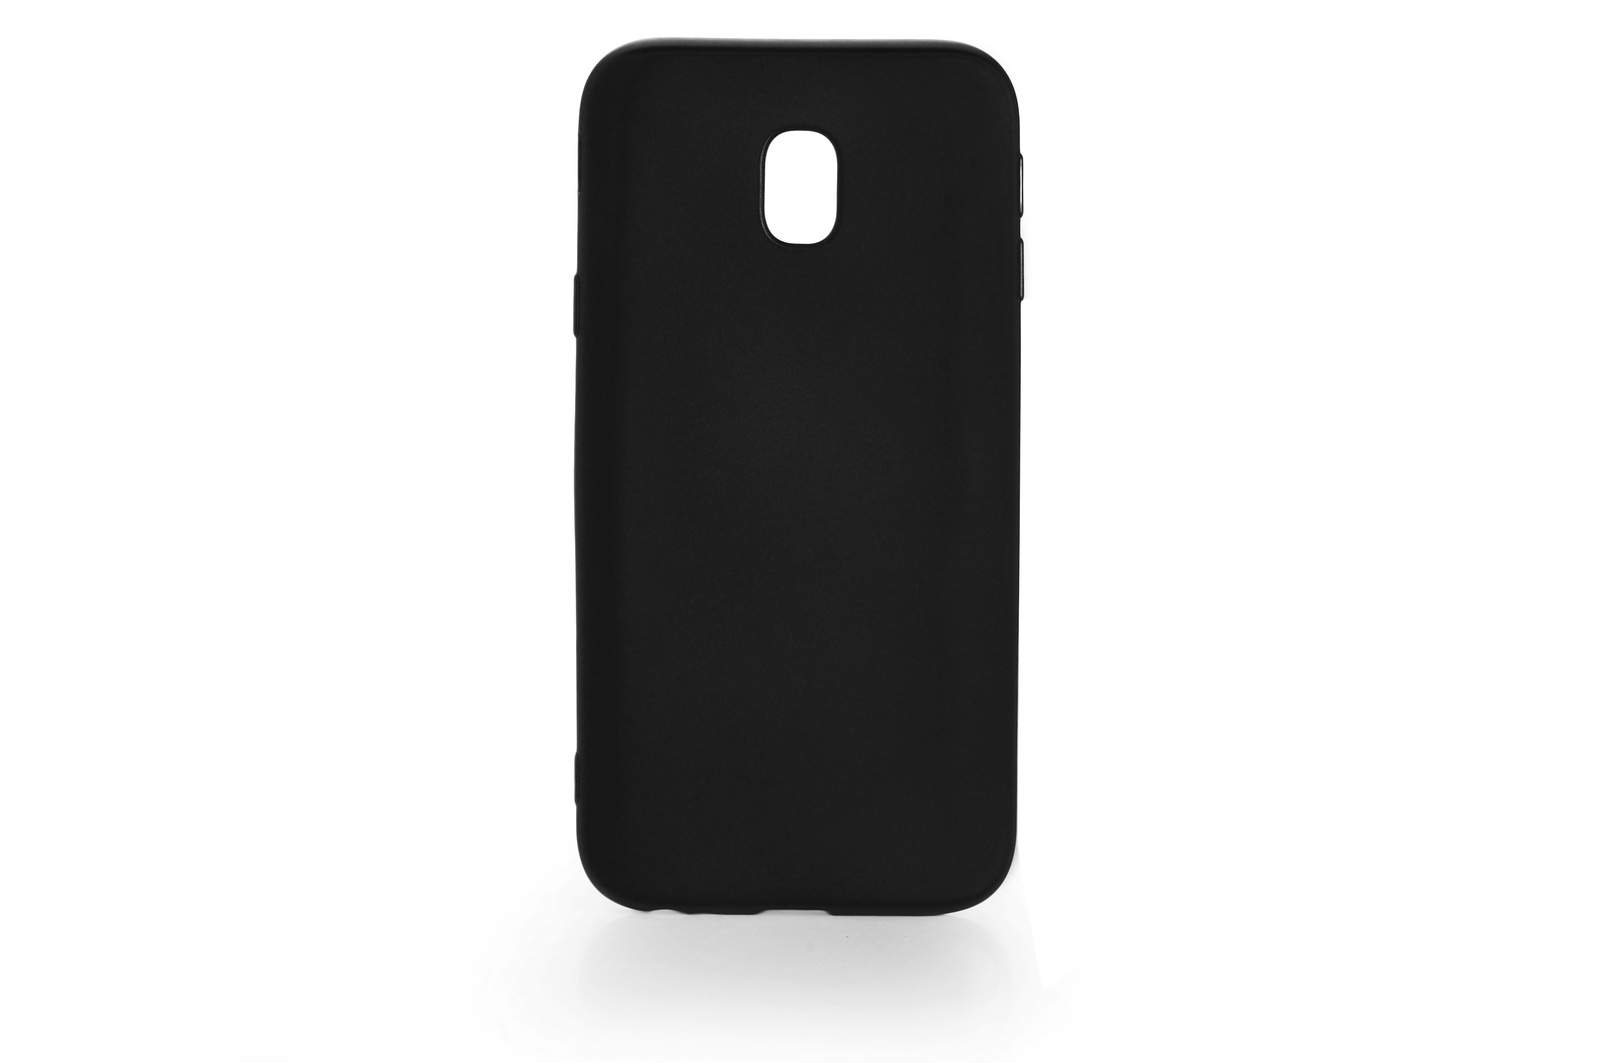 Чехол для сотового телефона Gurdini Чехол накладка силикон Soft Touch для Samsung Galaxy J3 2017 (J 330), 904082, черный